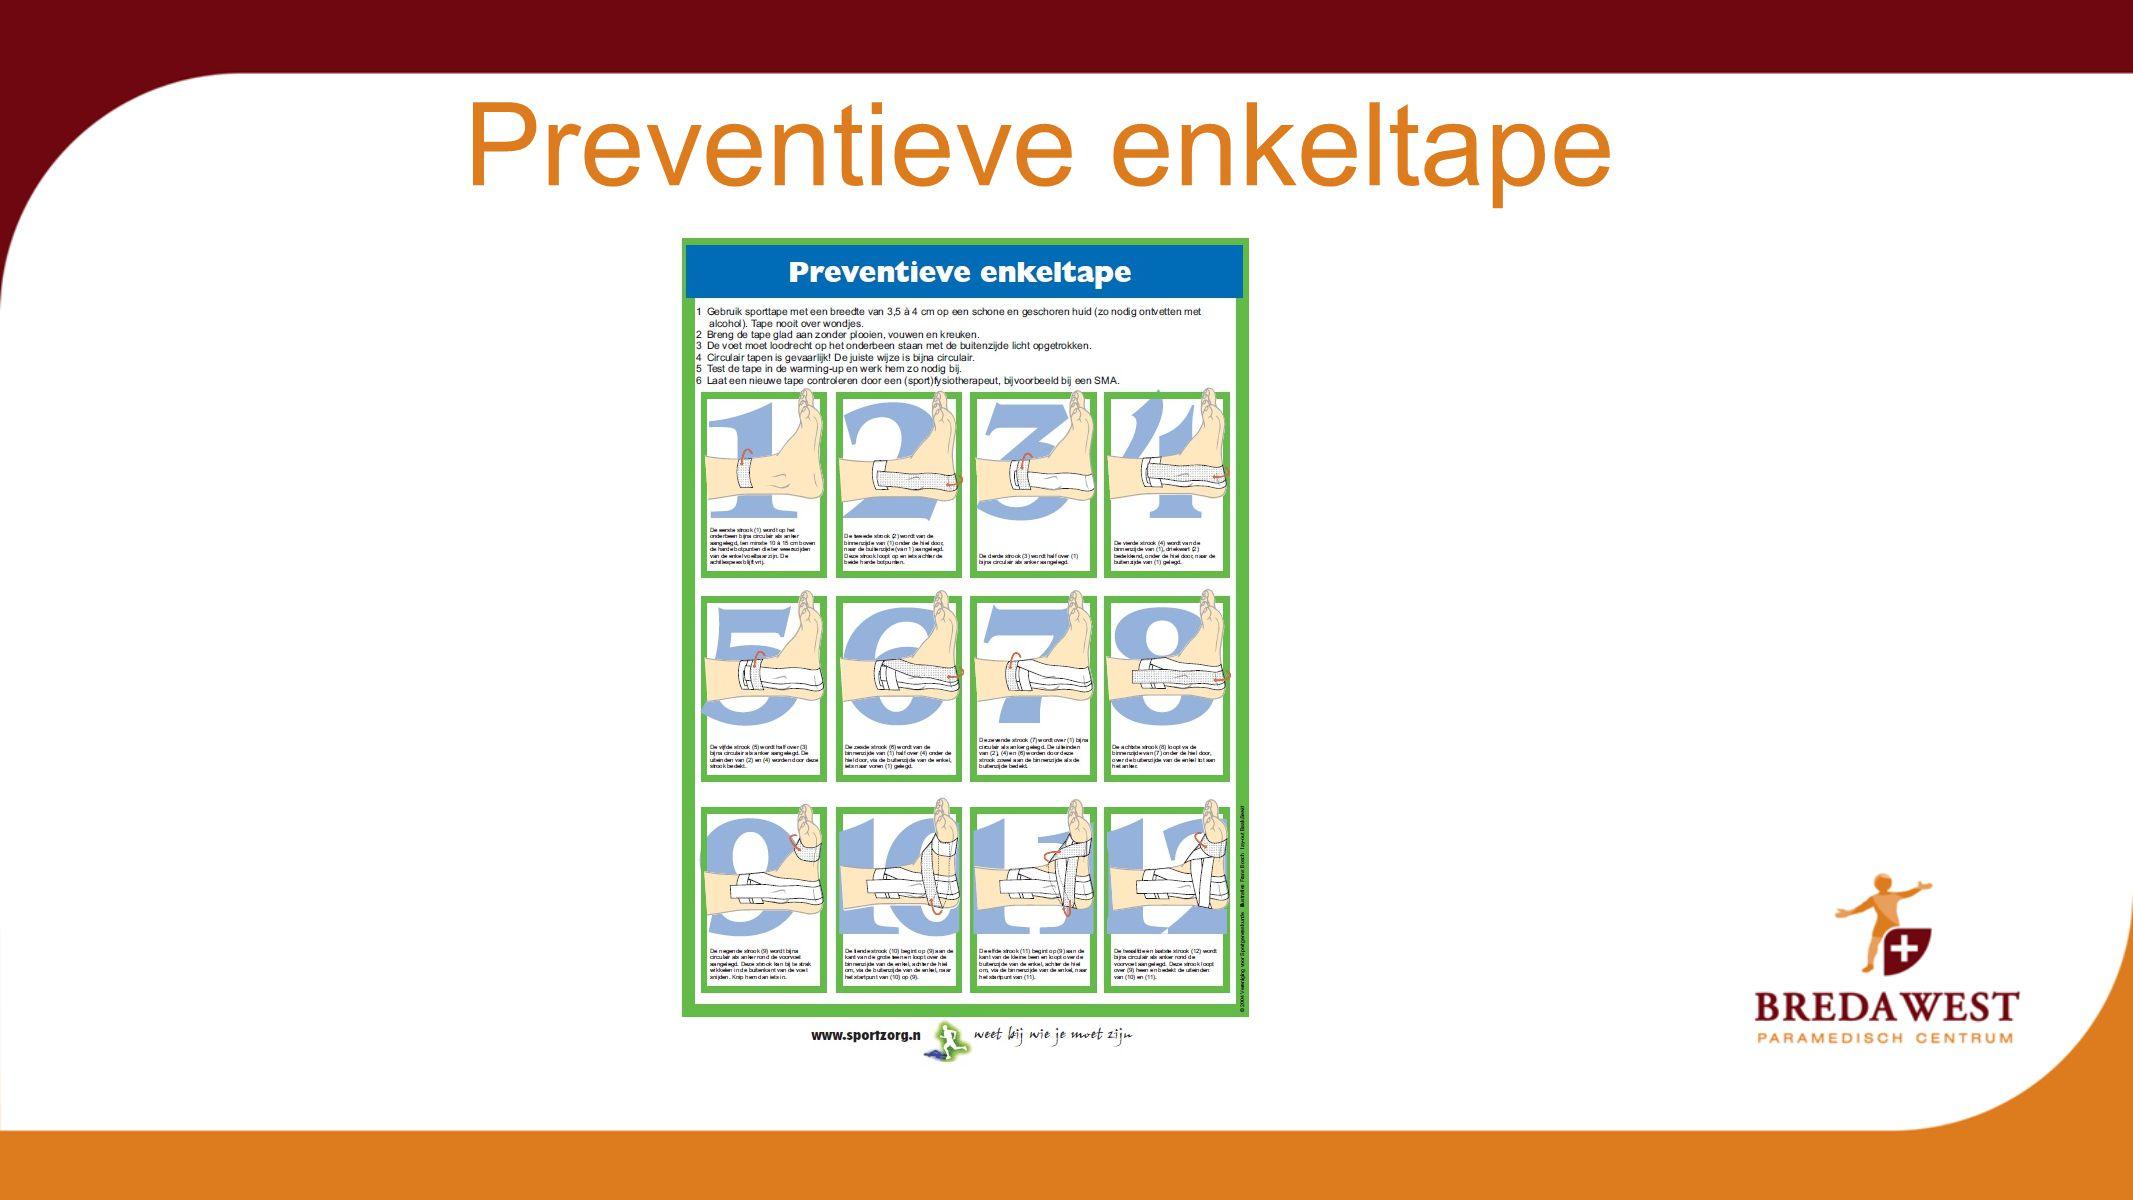 Preventieve enkeltape